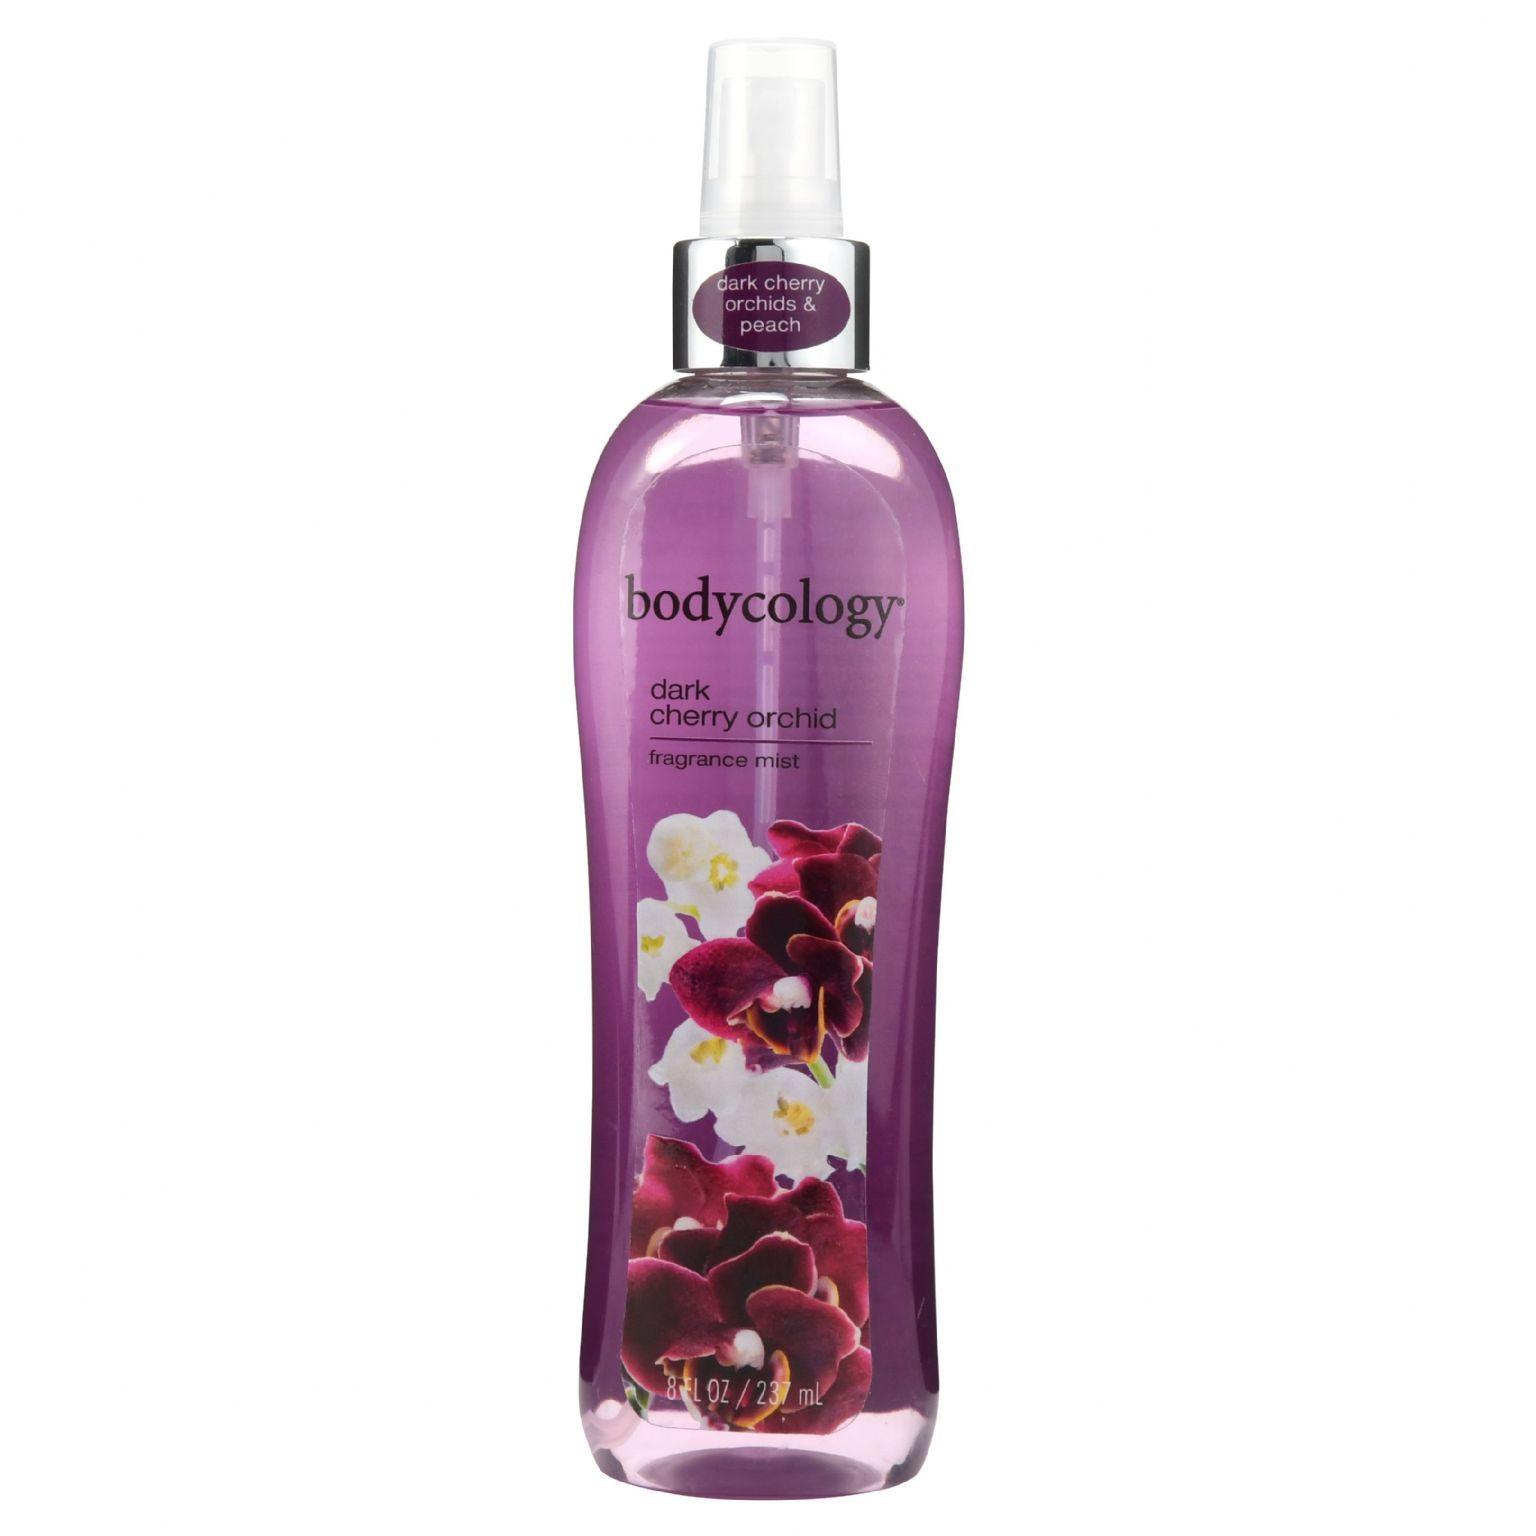 Dark Cherry Orchid Fragrance Mist